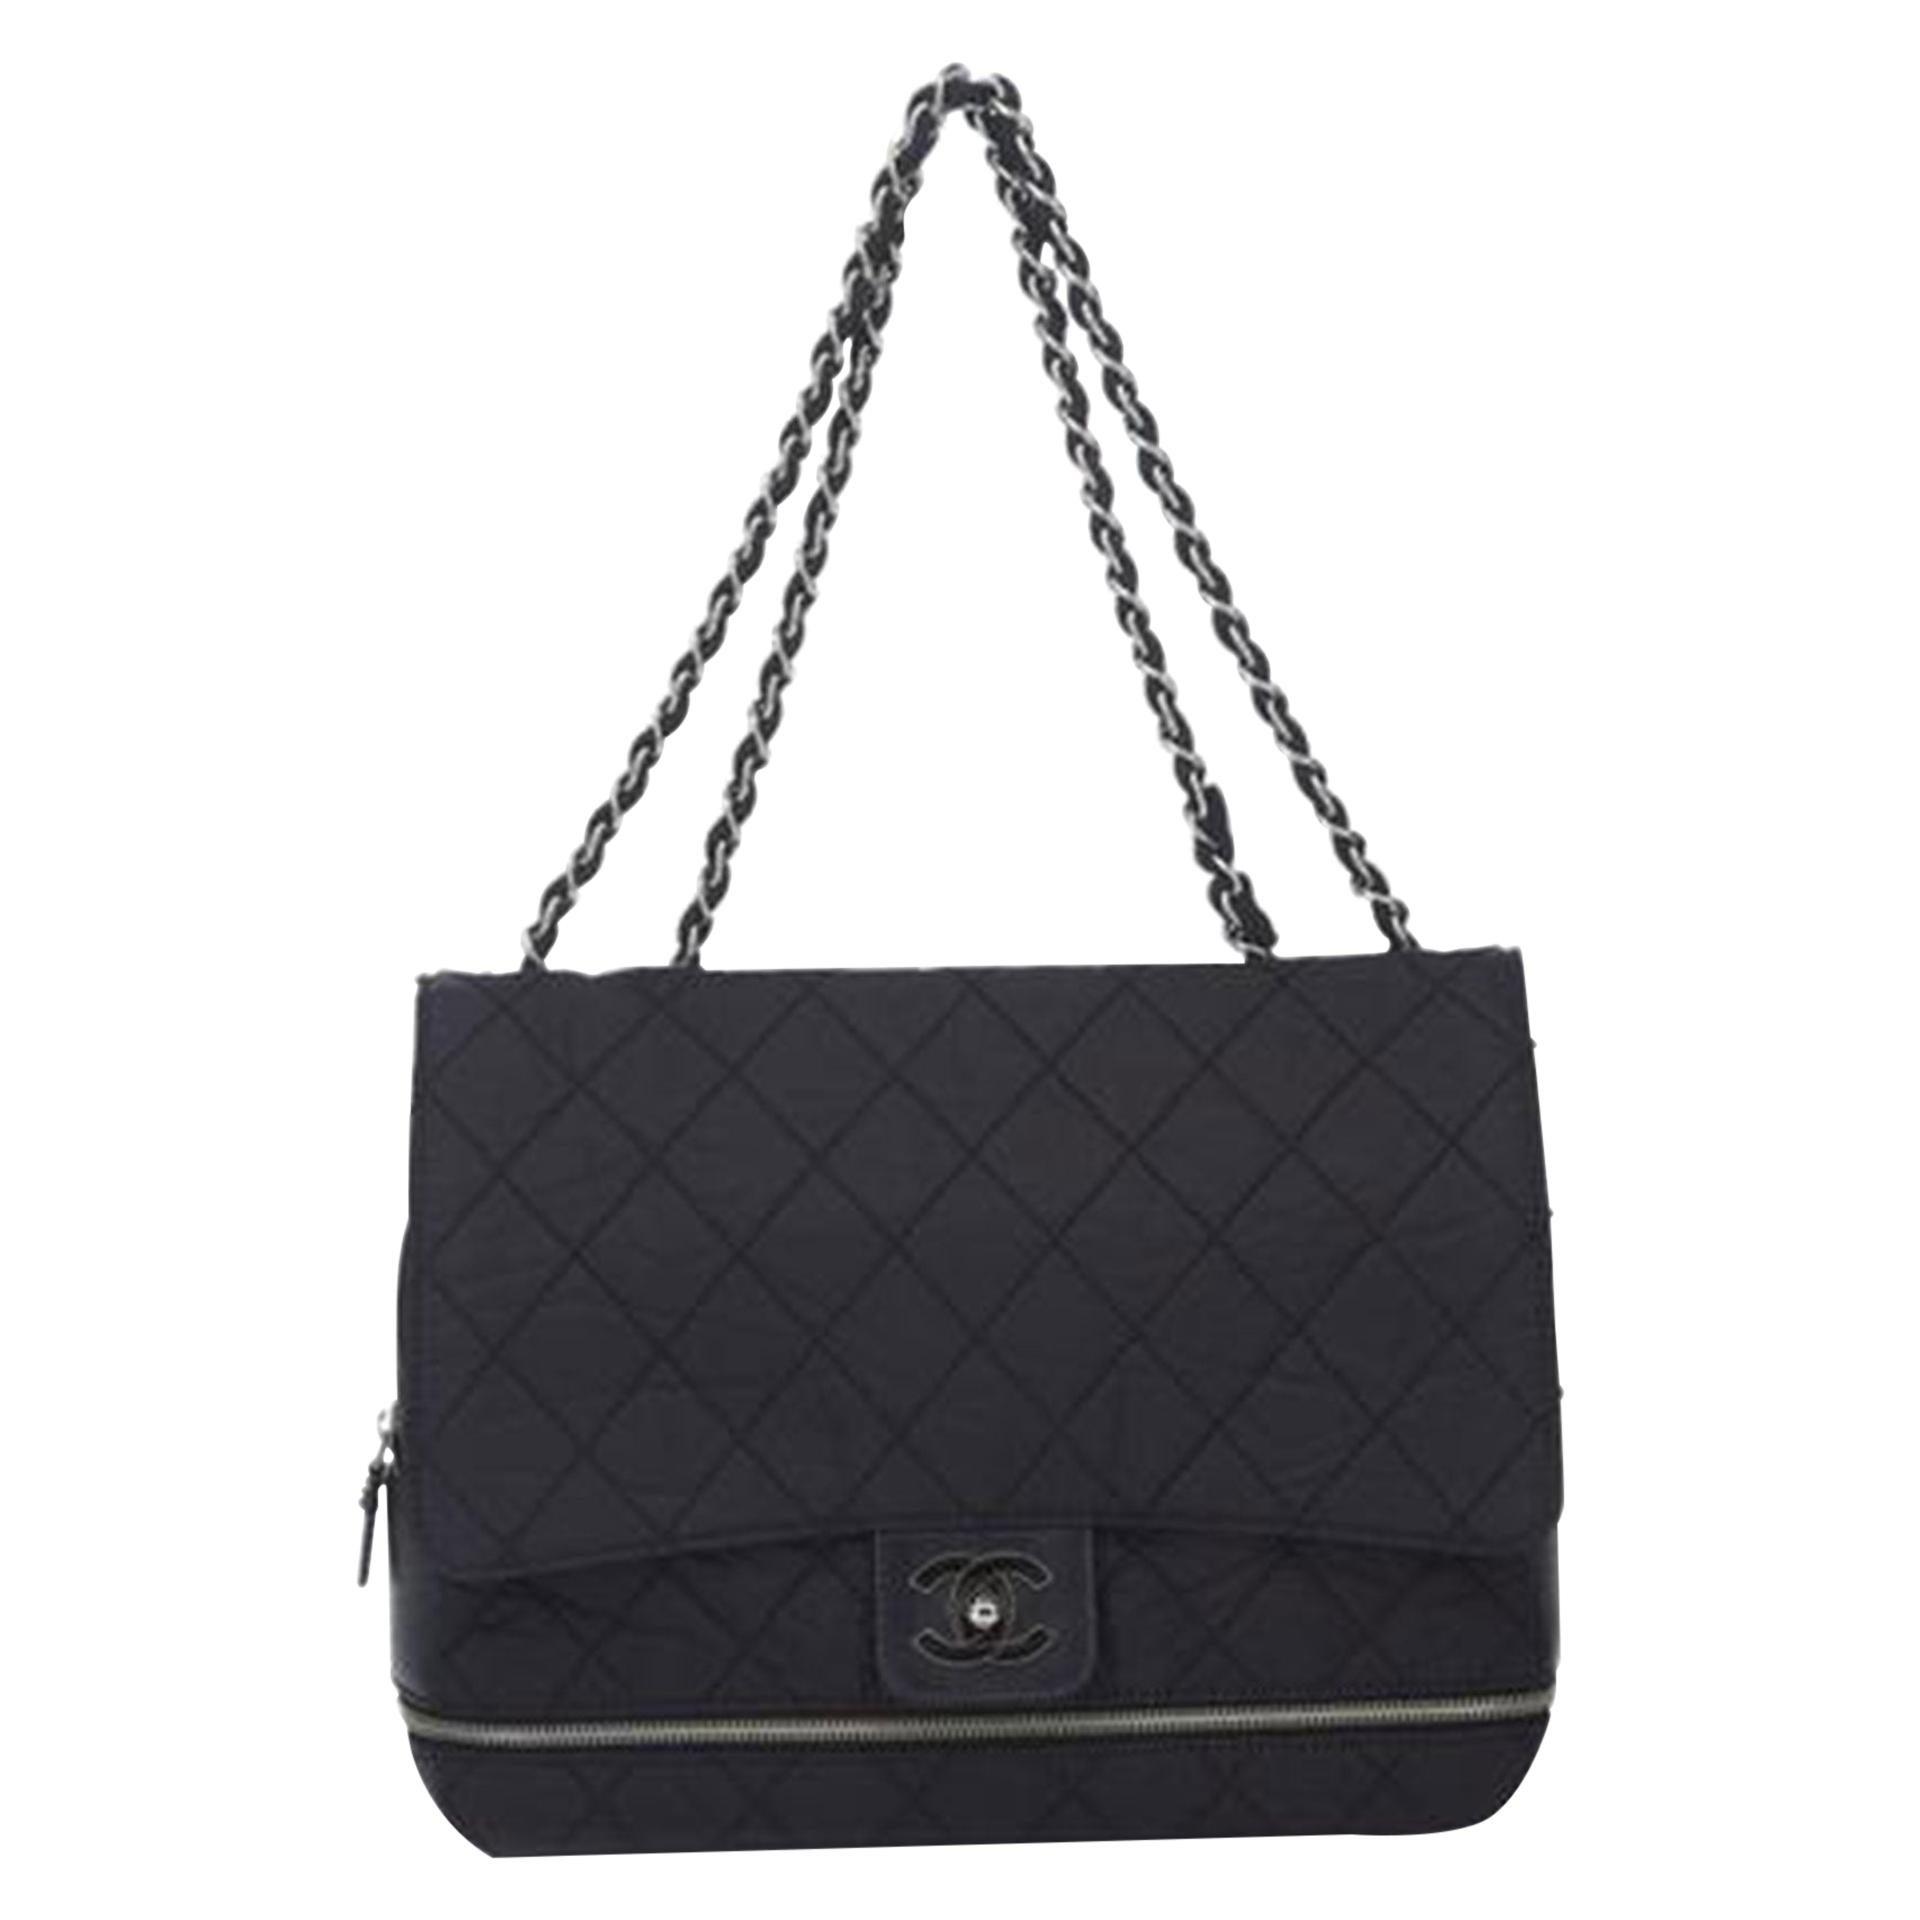 Chanel Matelasse Chain Flap Black Nylon Shoulder Bag